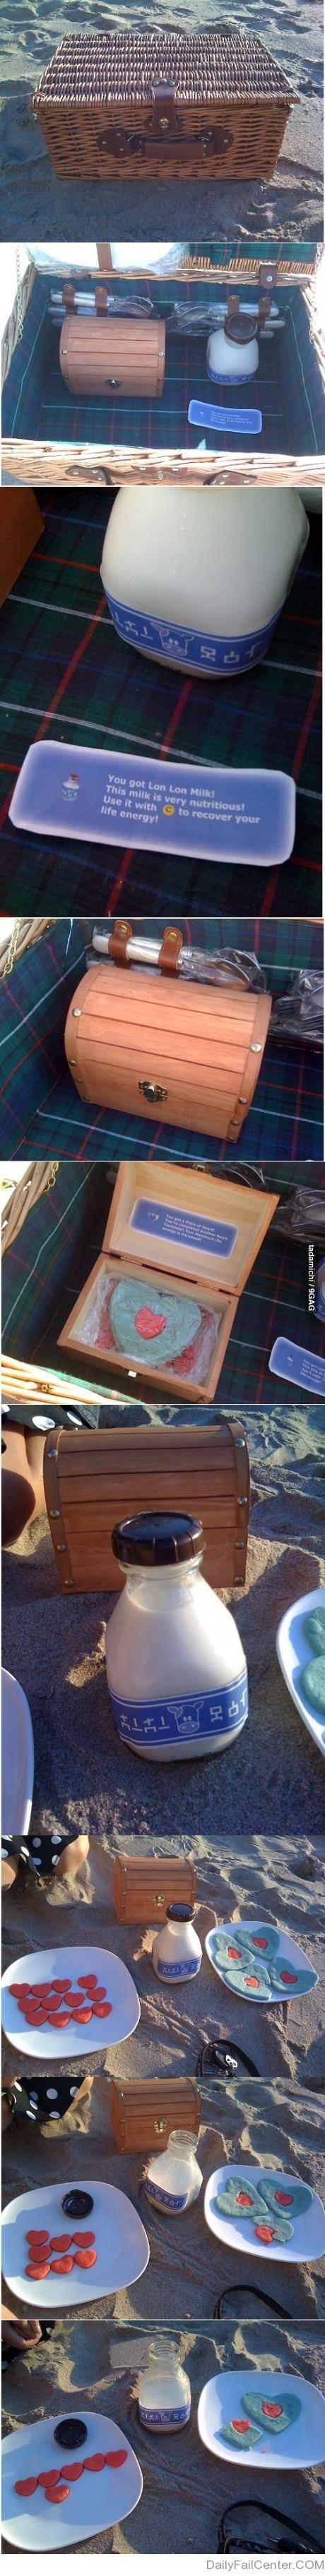 Zelda picnic!!!